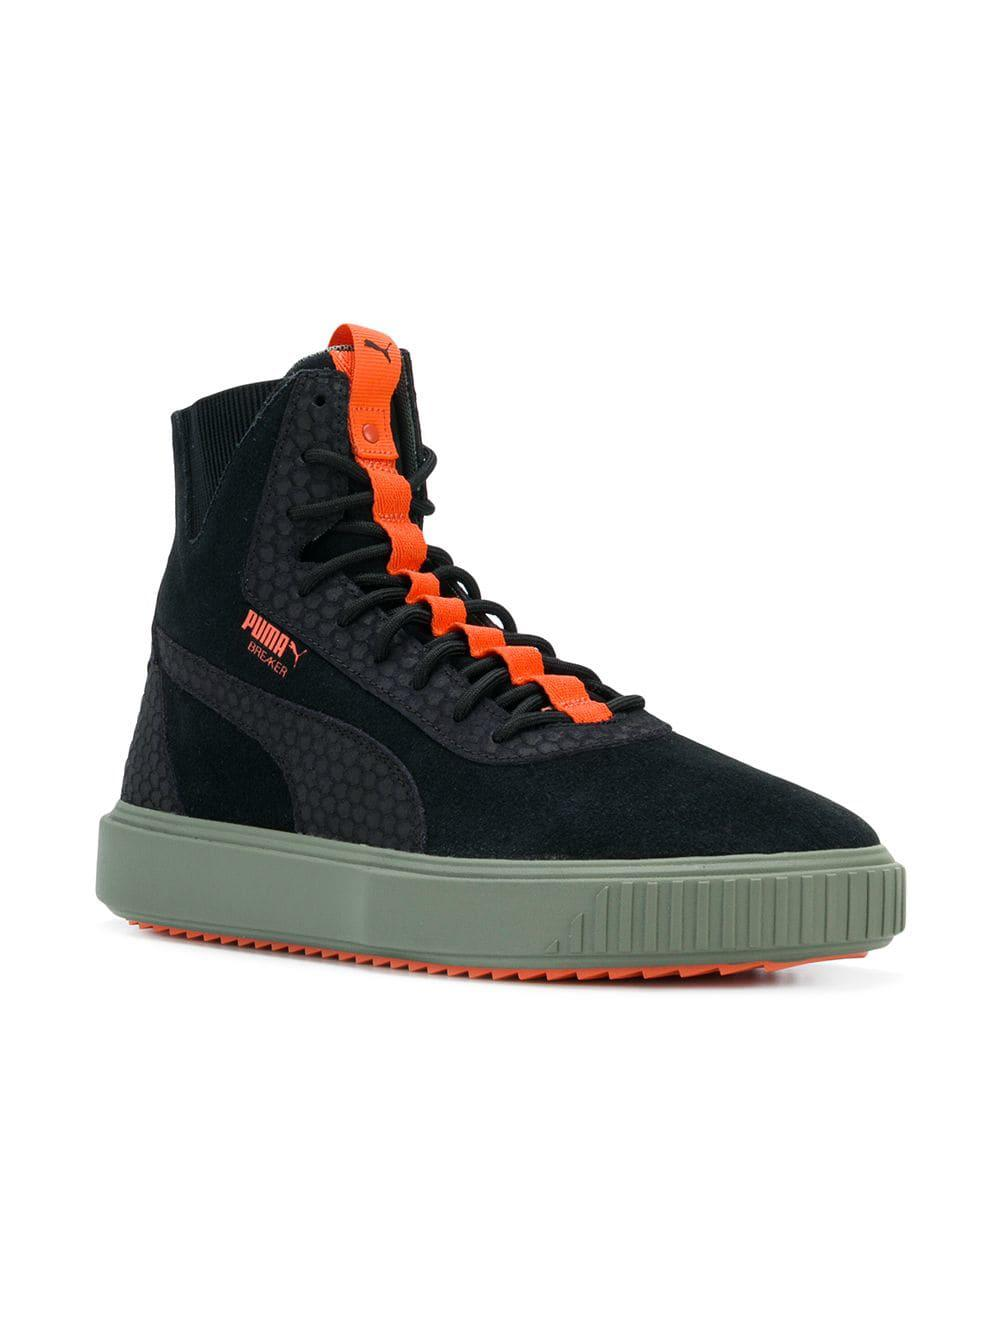 04422661c701 Lyst - PUMA Breaker High-top Sneakers in Black for Men